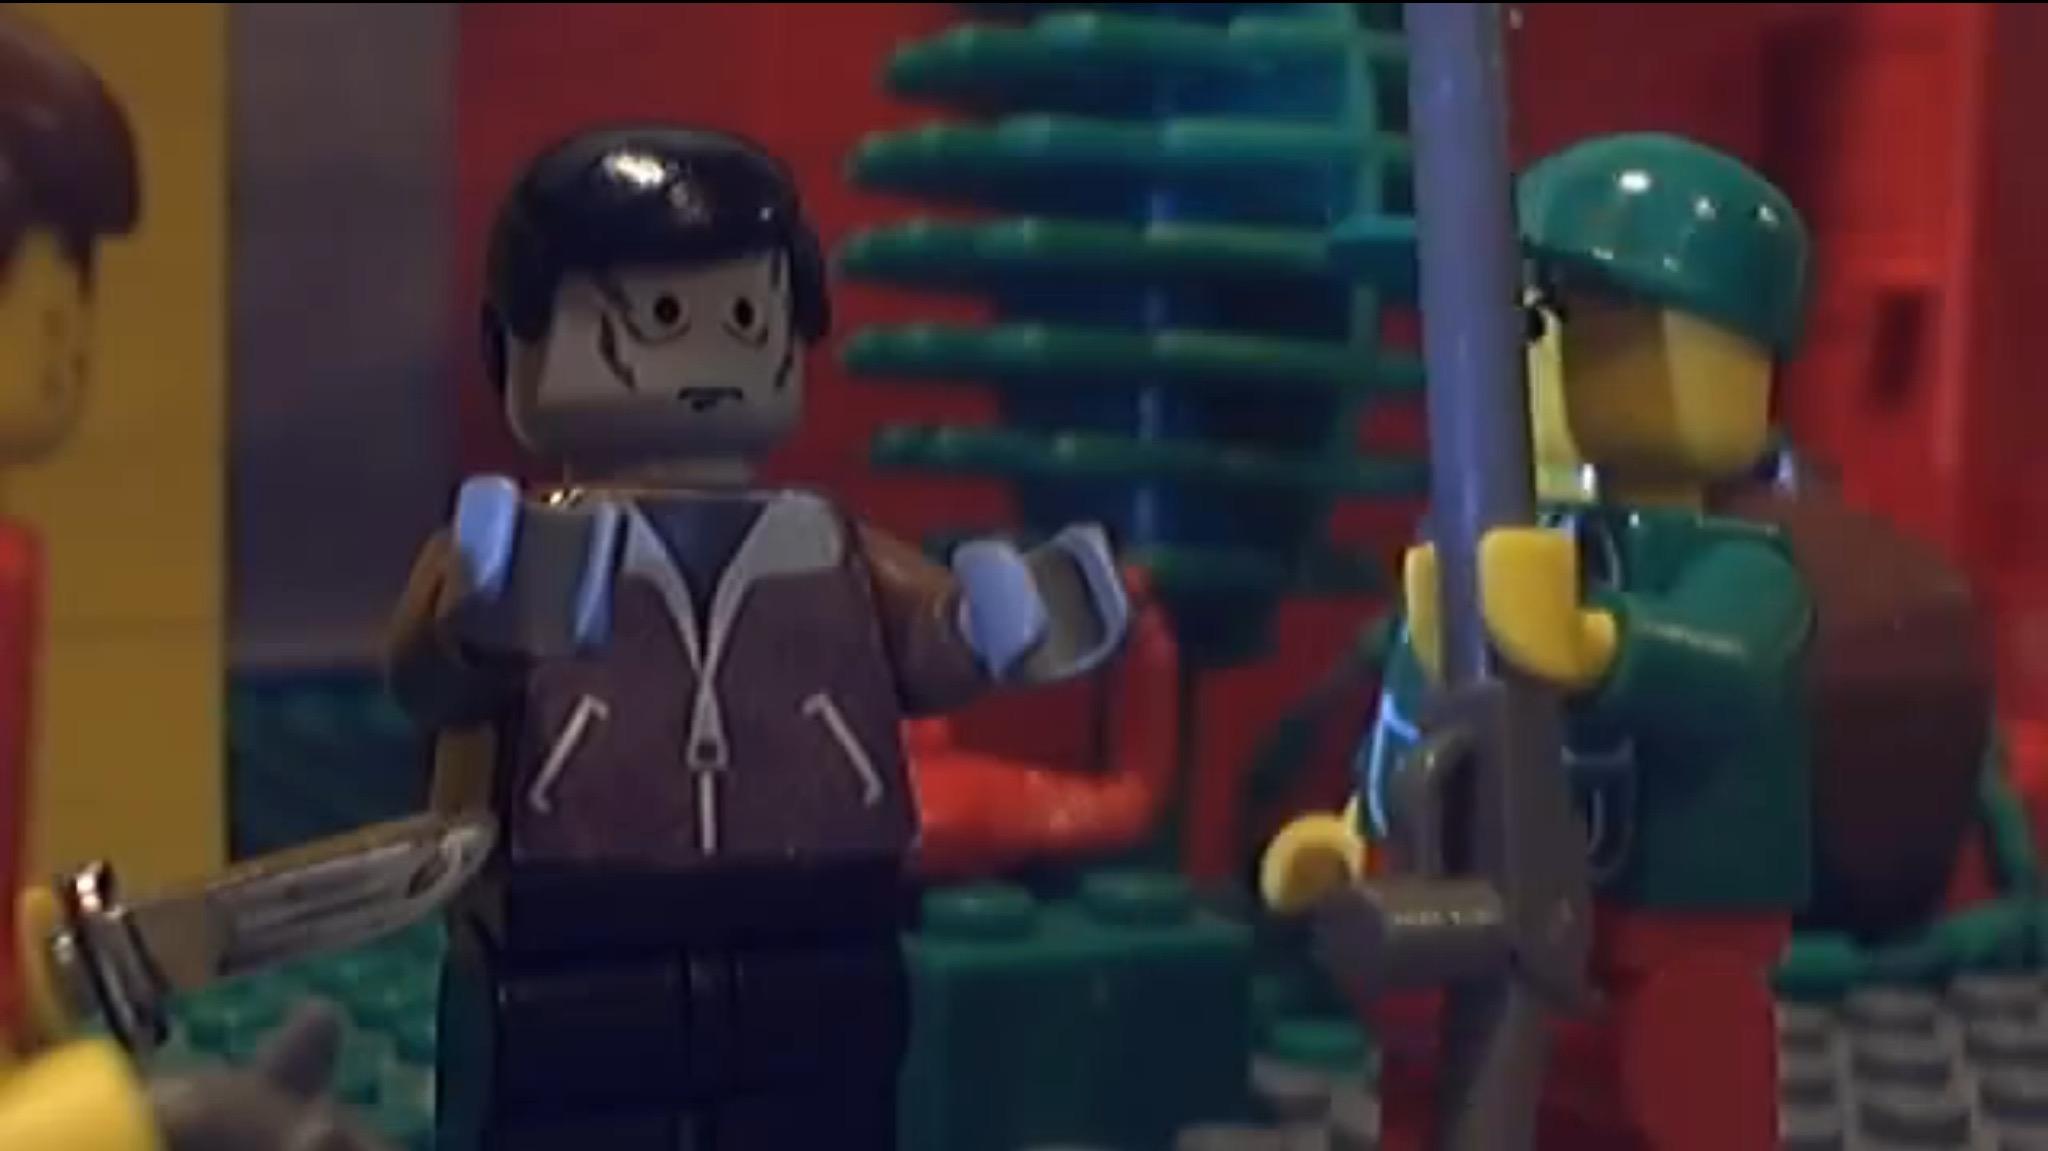 https://bricksafe.com/files/LegoSkeleton2000/brickfilm-showcase/FullSizeRender%281%29.jpg